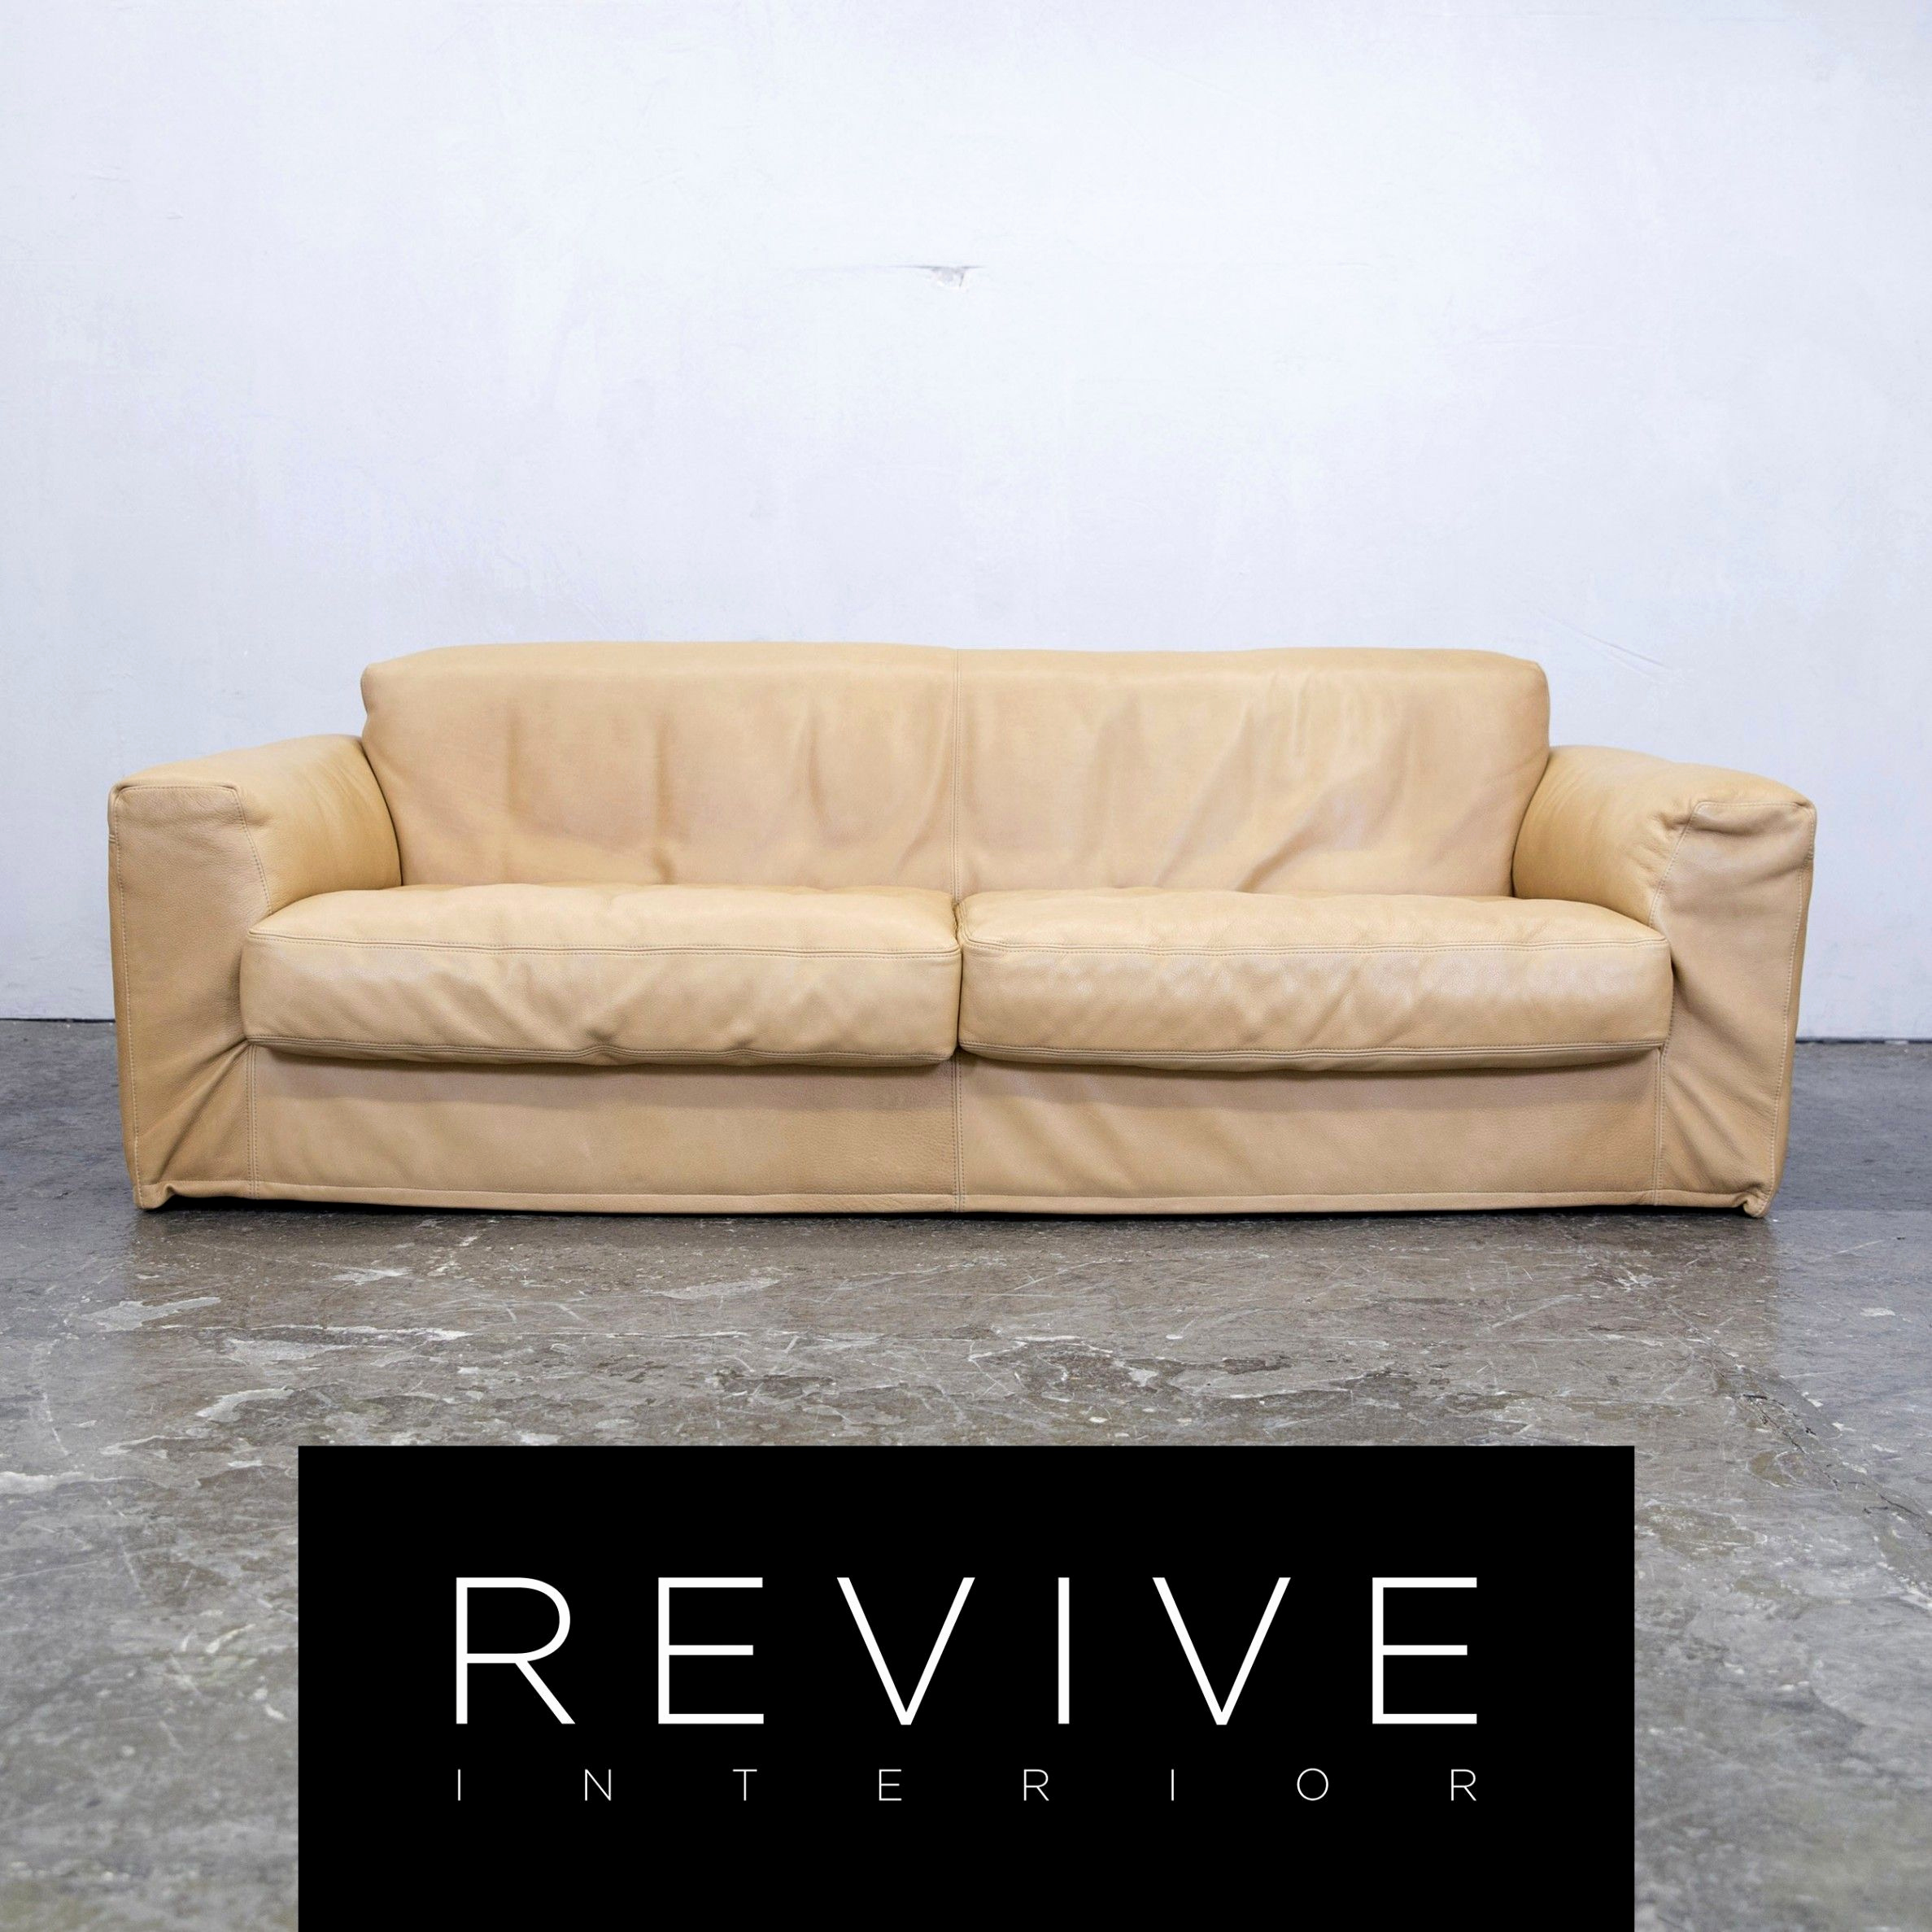 Rocking Chair Exterieur Ikea Meilleur De Photos 50 New Best Ikea sofa Pics 50 S